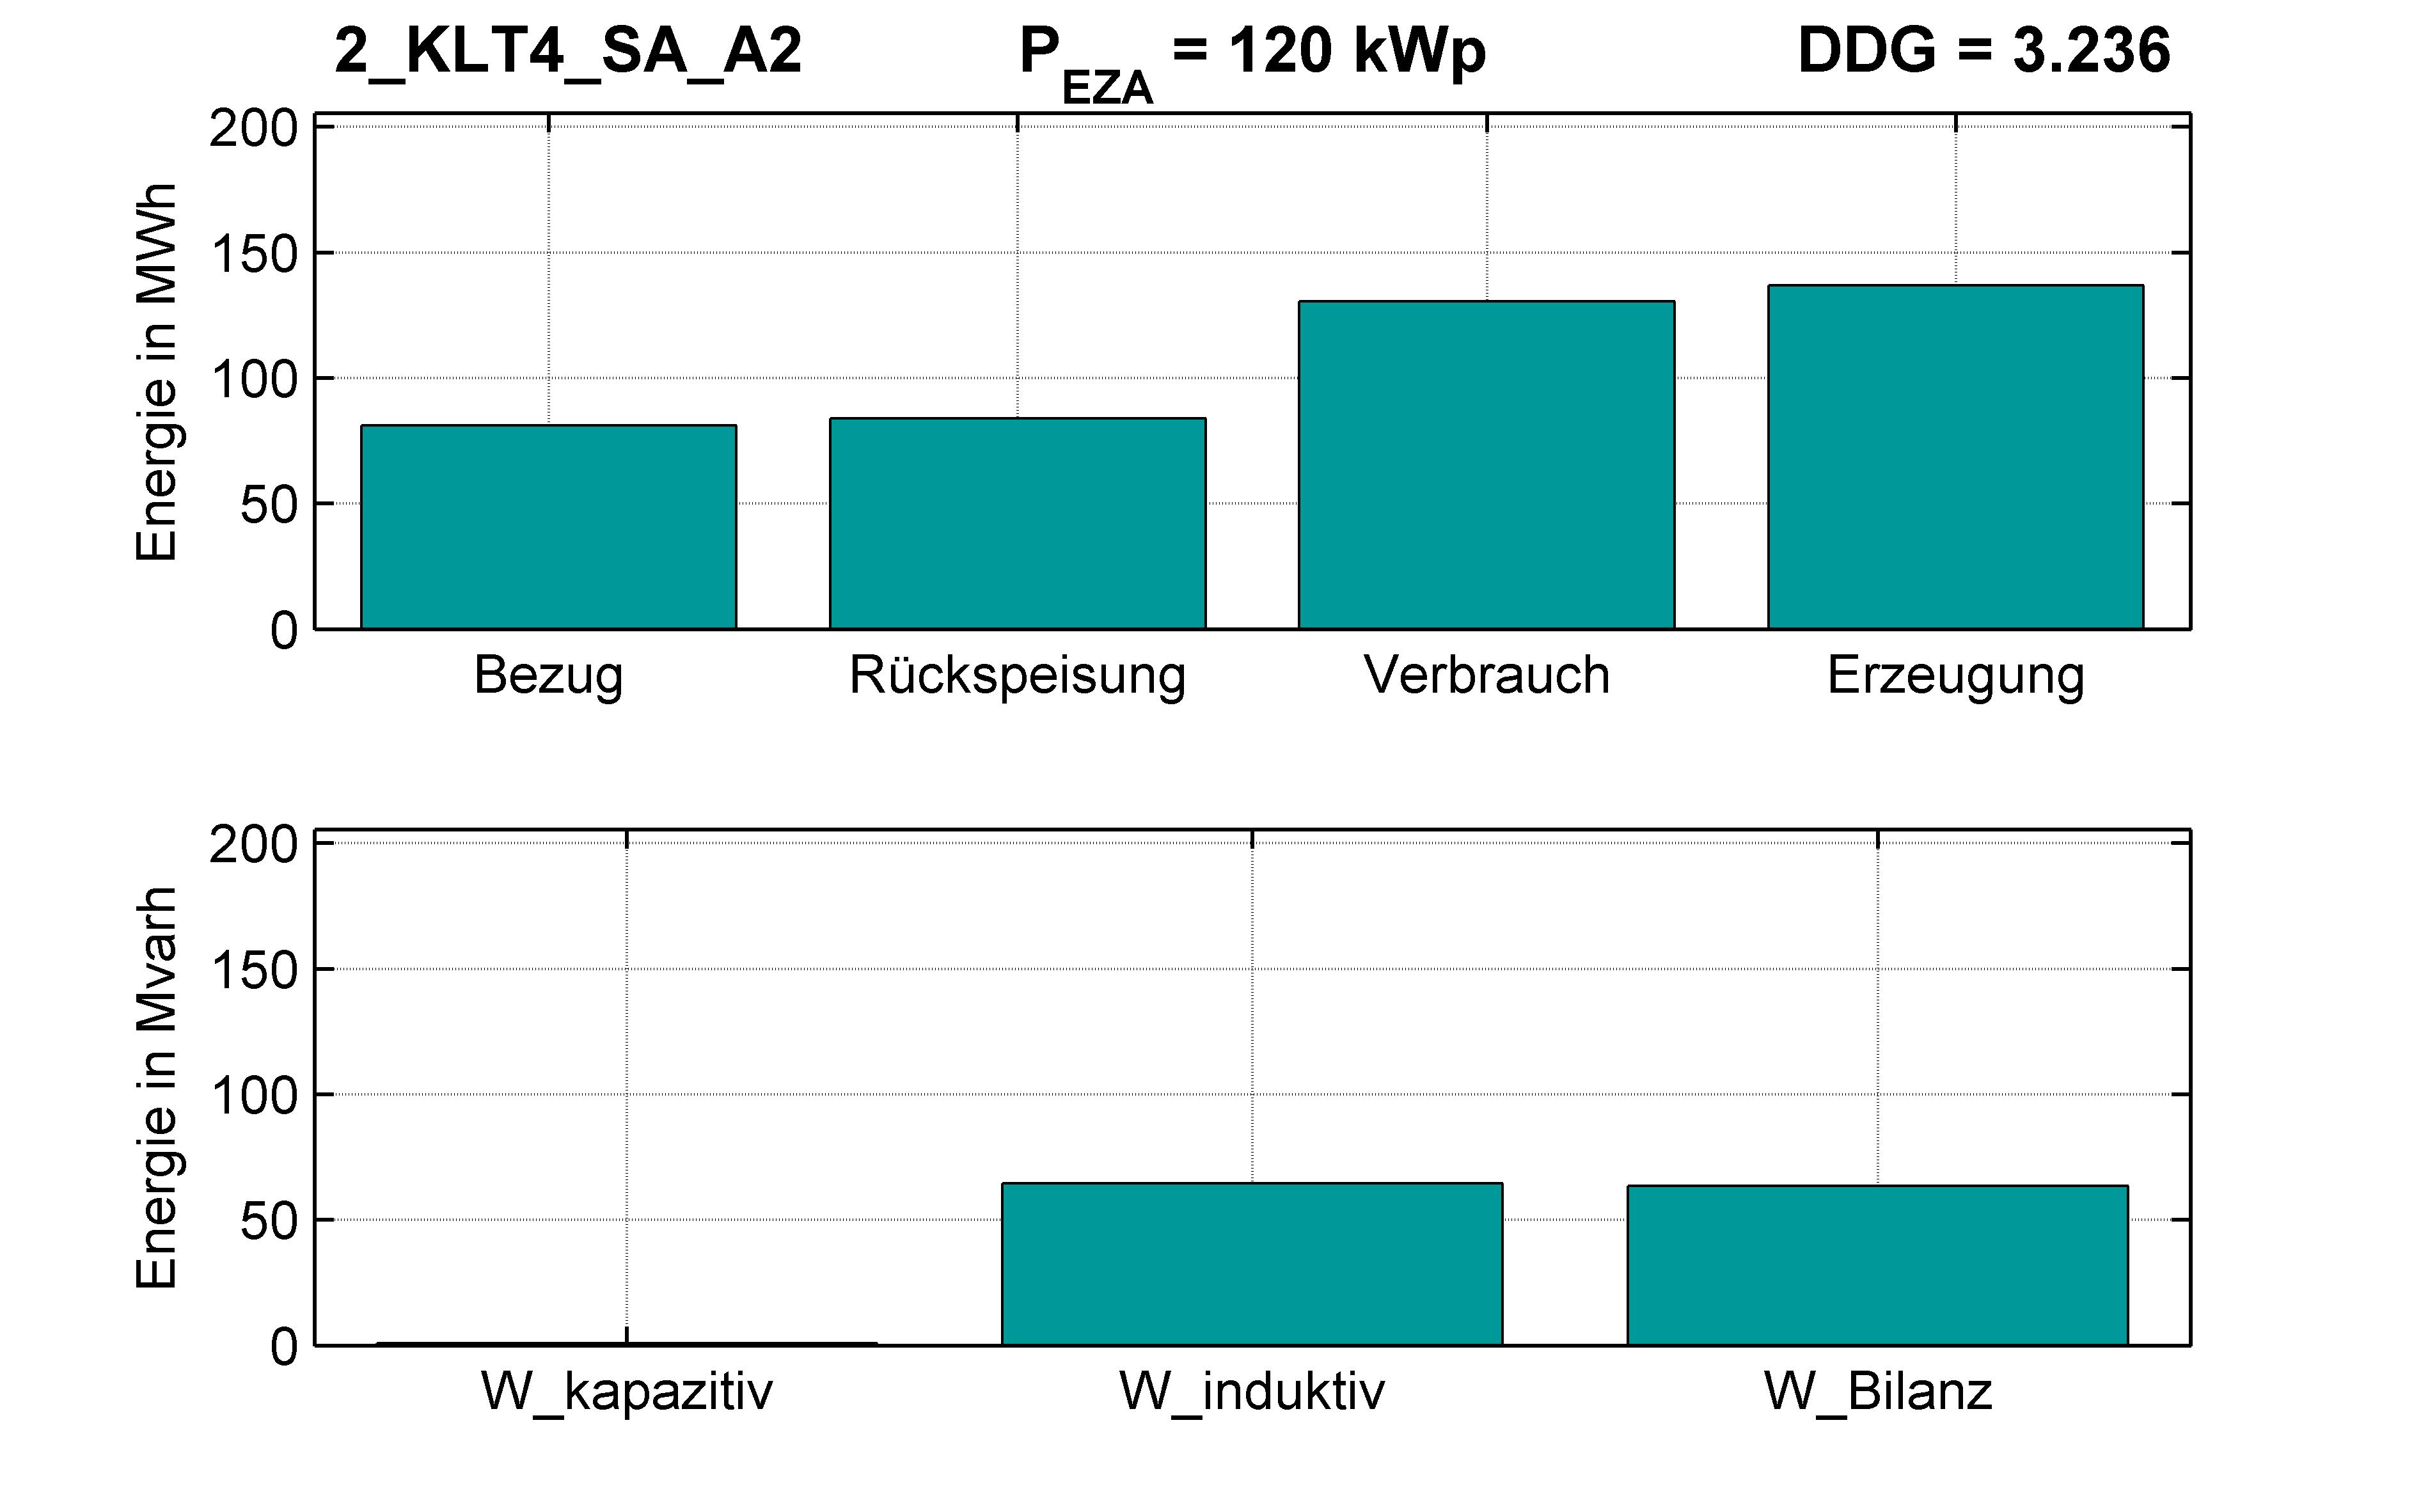 KLT4 | P-Kappung 85% (SA) A2 | PQ-Bilanz